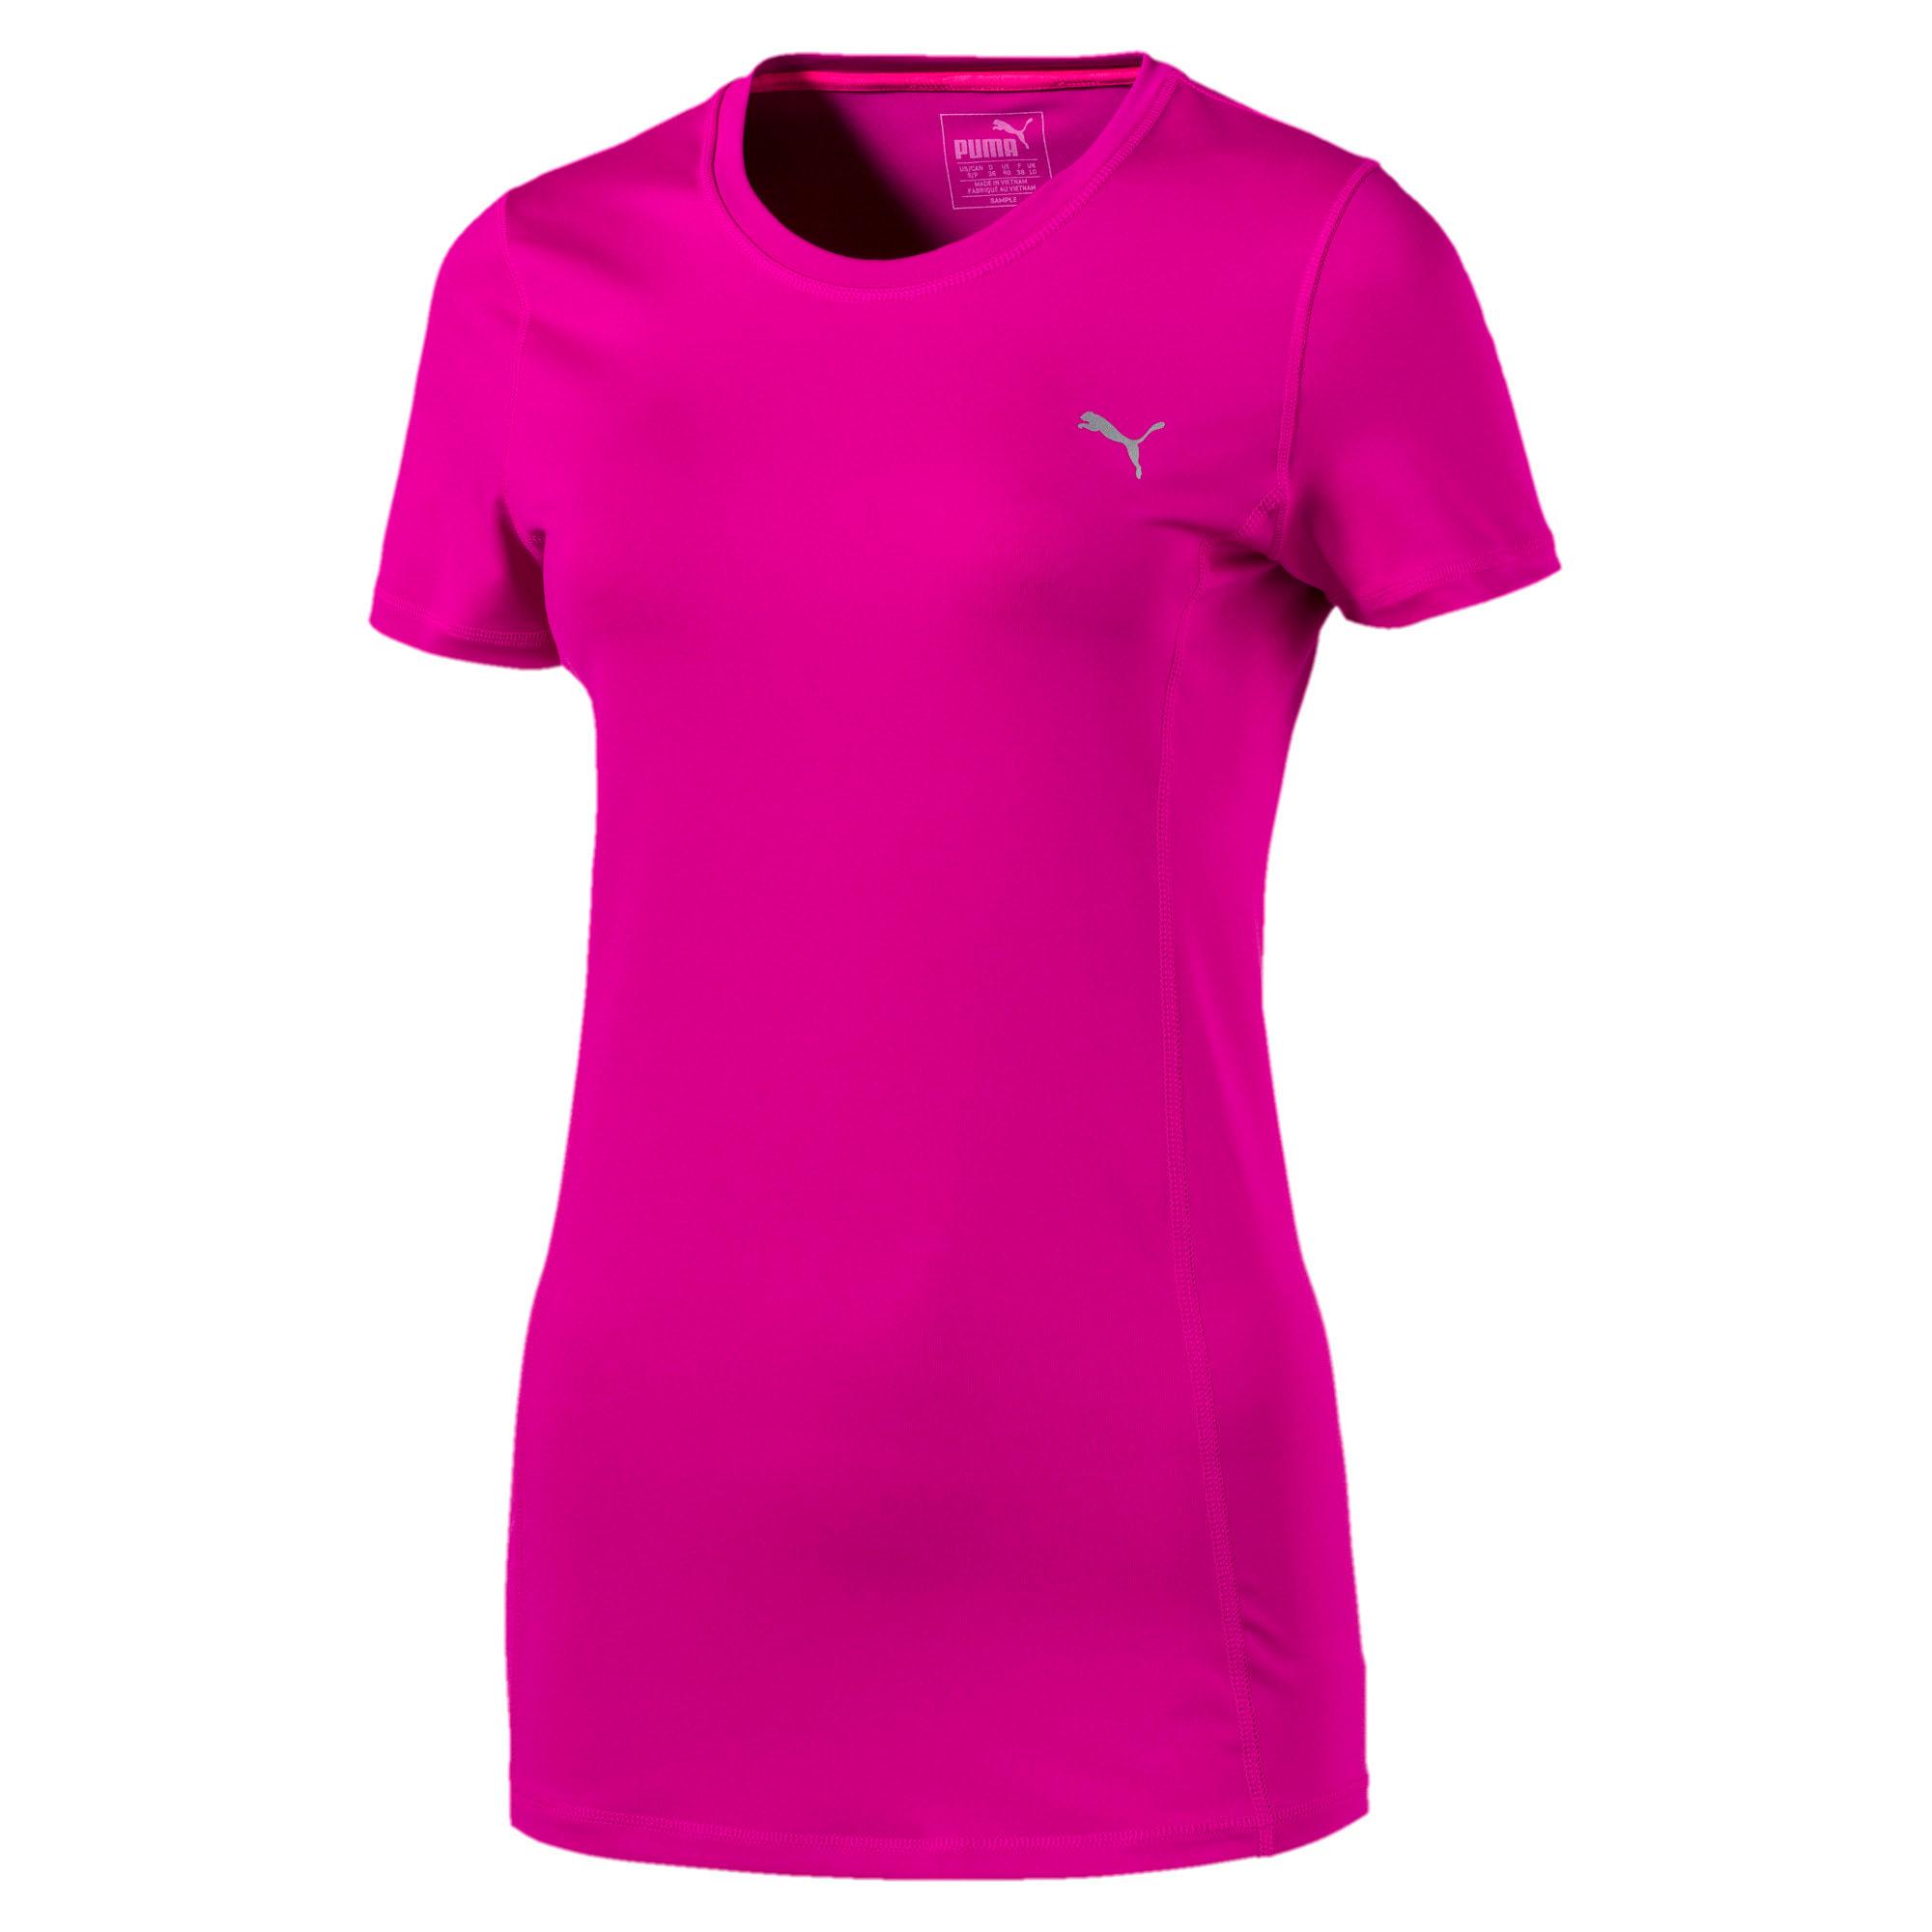 Thumbnail 4 of Training Women's Essential T-Shirt, ULTRA MAGENTA, medium-IND